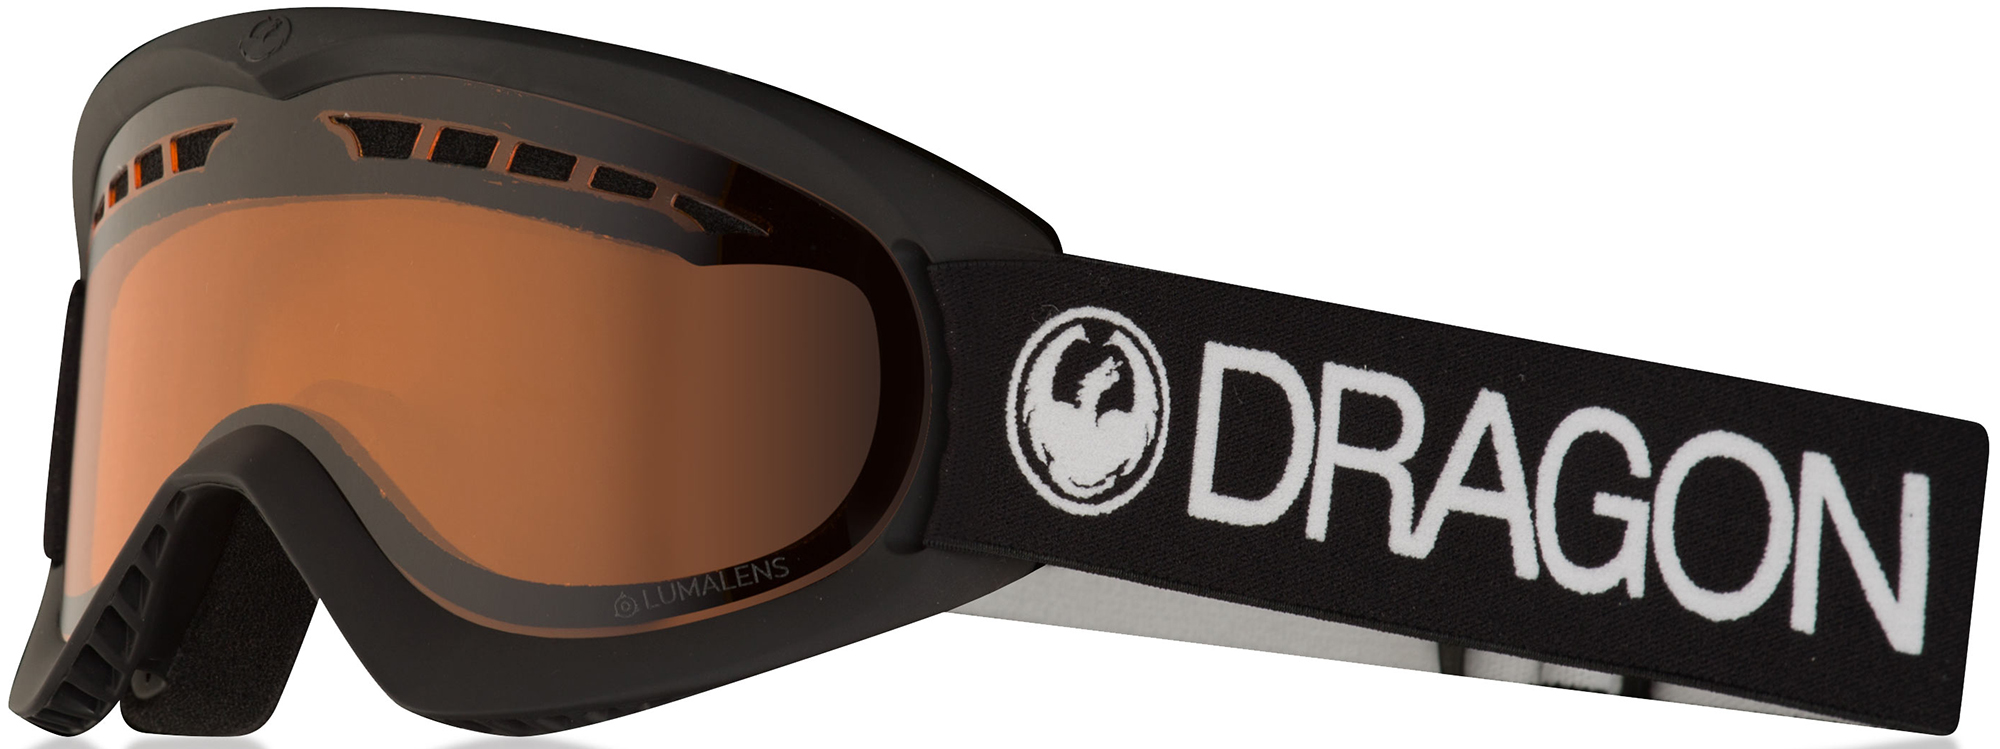 маска для сноуборда dragon d2 murdered dark smoke Dragon Маска Dragon Dx Black - Lumalens